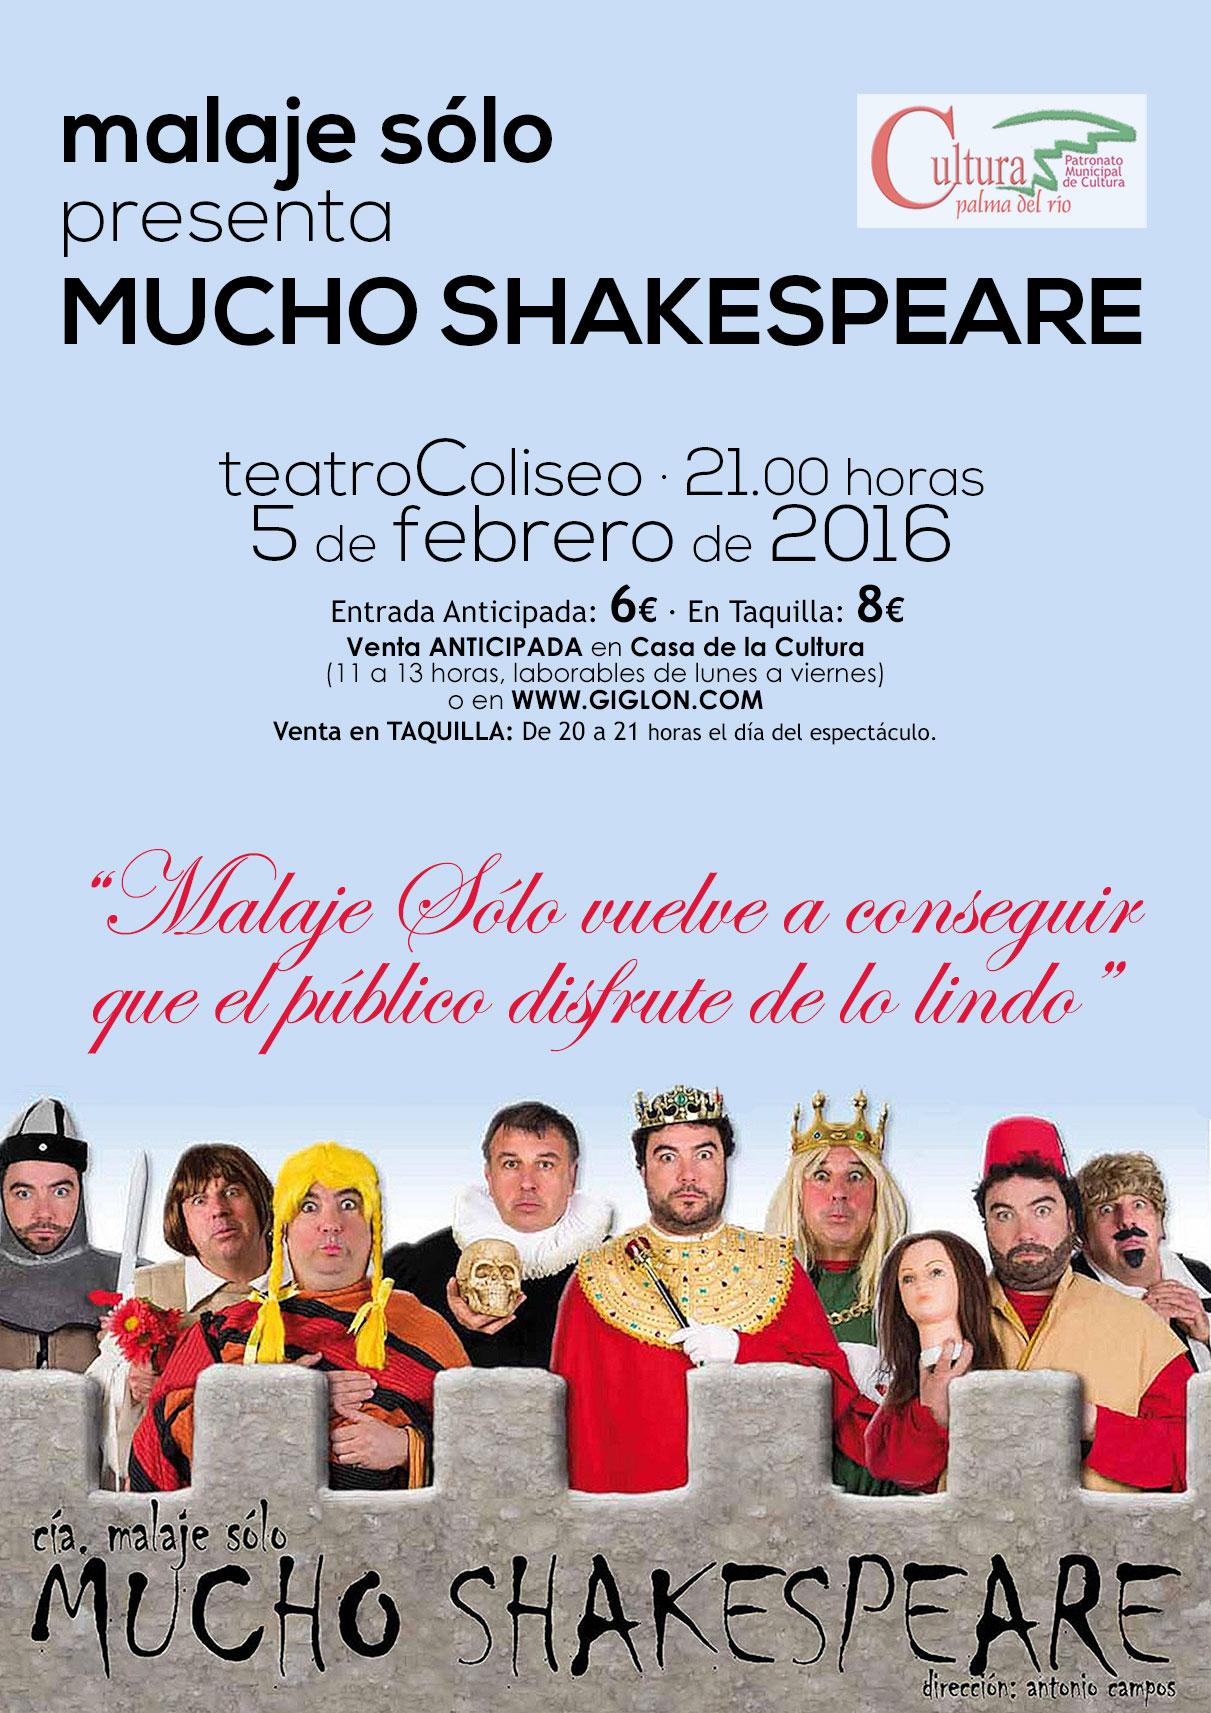 https://www.palmadelrio.es/sites/default/files/web_malaje-solo-shakespeare.jpg